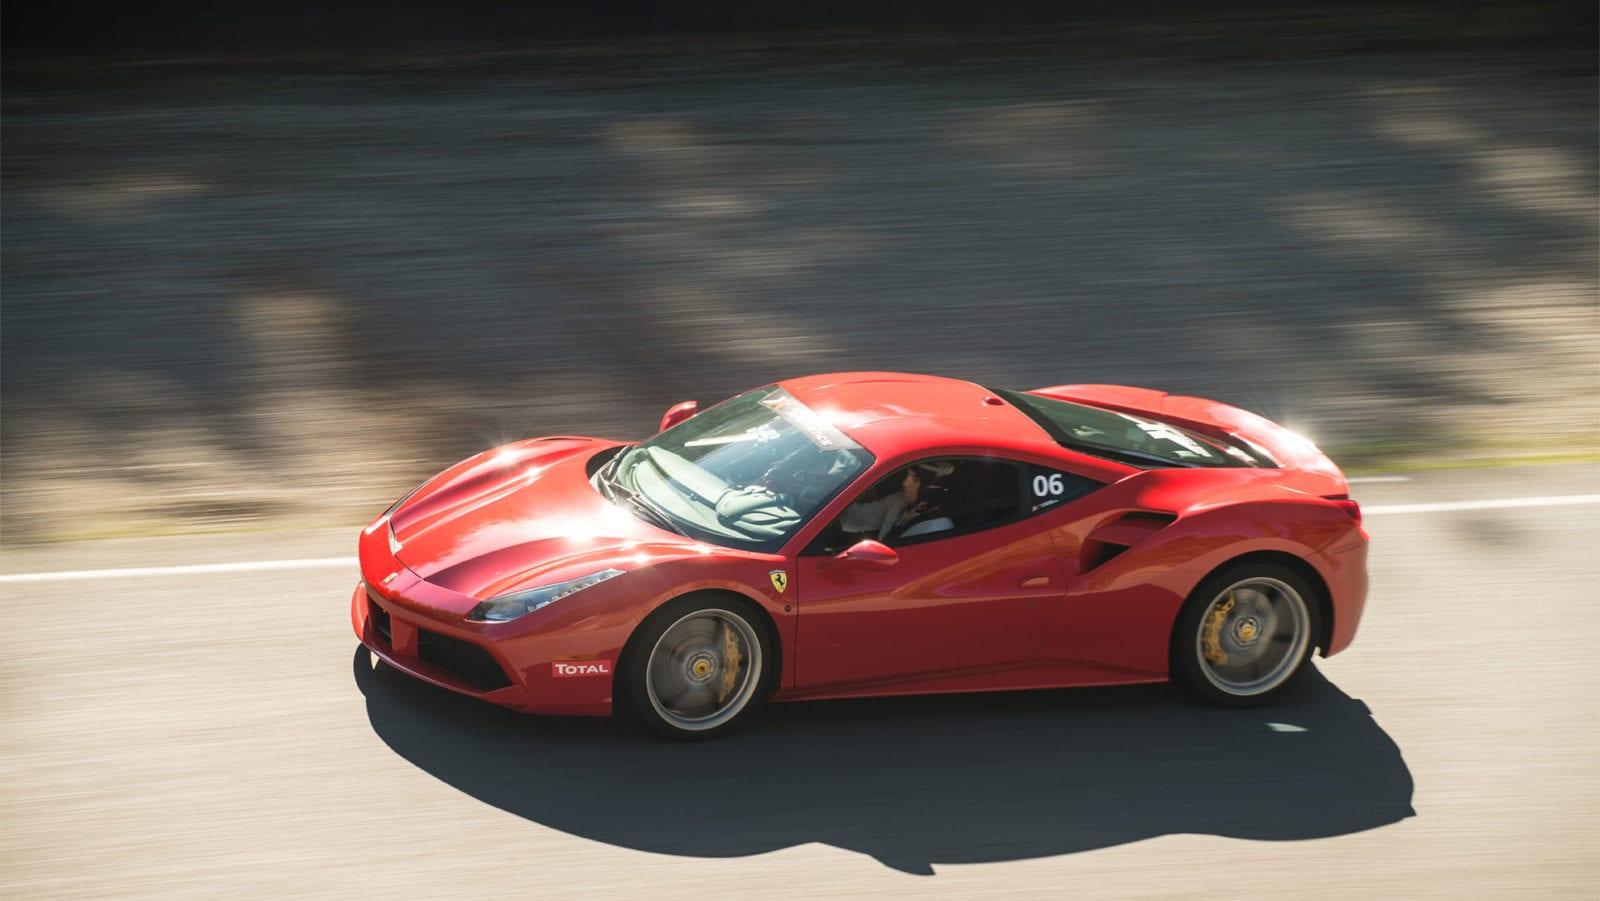 Ferrari 488 GTB on racetrack